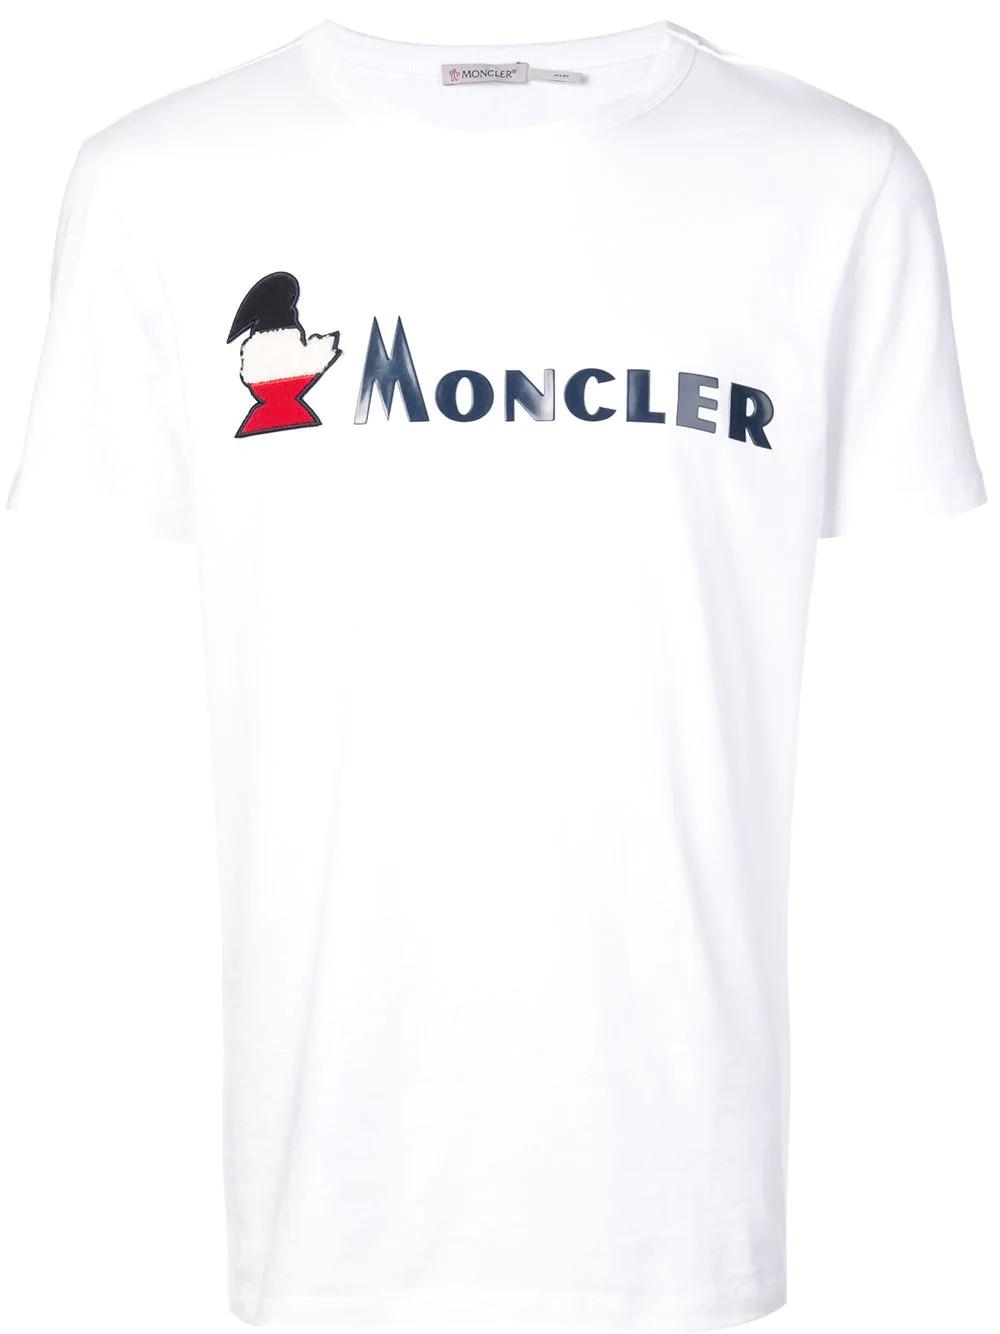 556137149 Moncler Logo Print T-Shirt - White | ModeSens